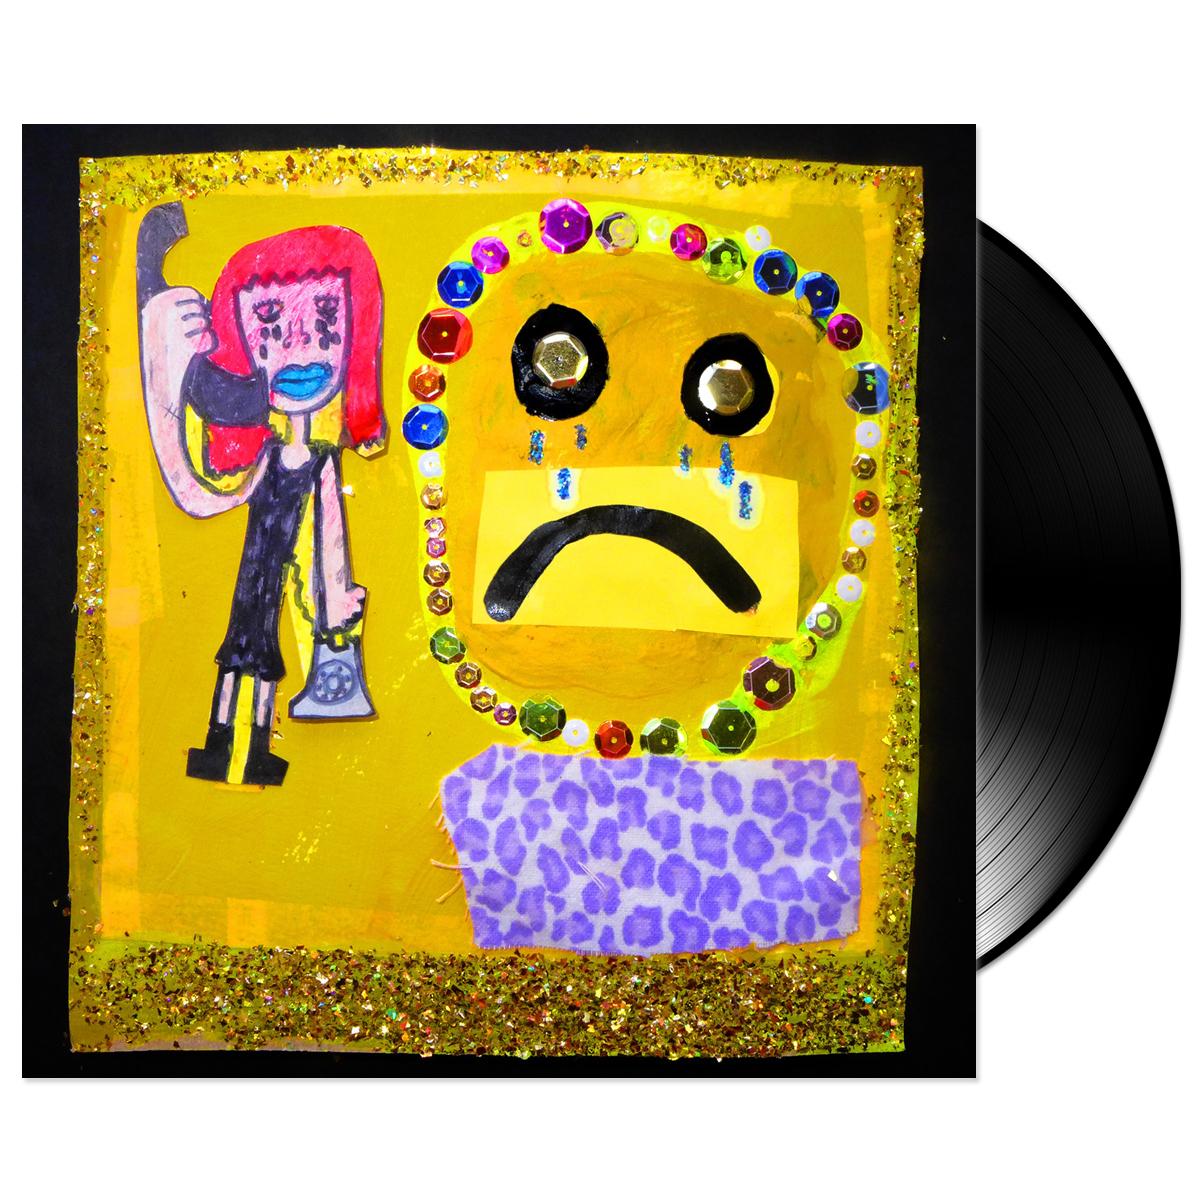 "Jessica Lea Mayfield ""Standing In The Sun"" b/w ""No Fun"" (live) 7"" LP"